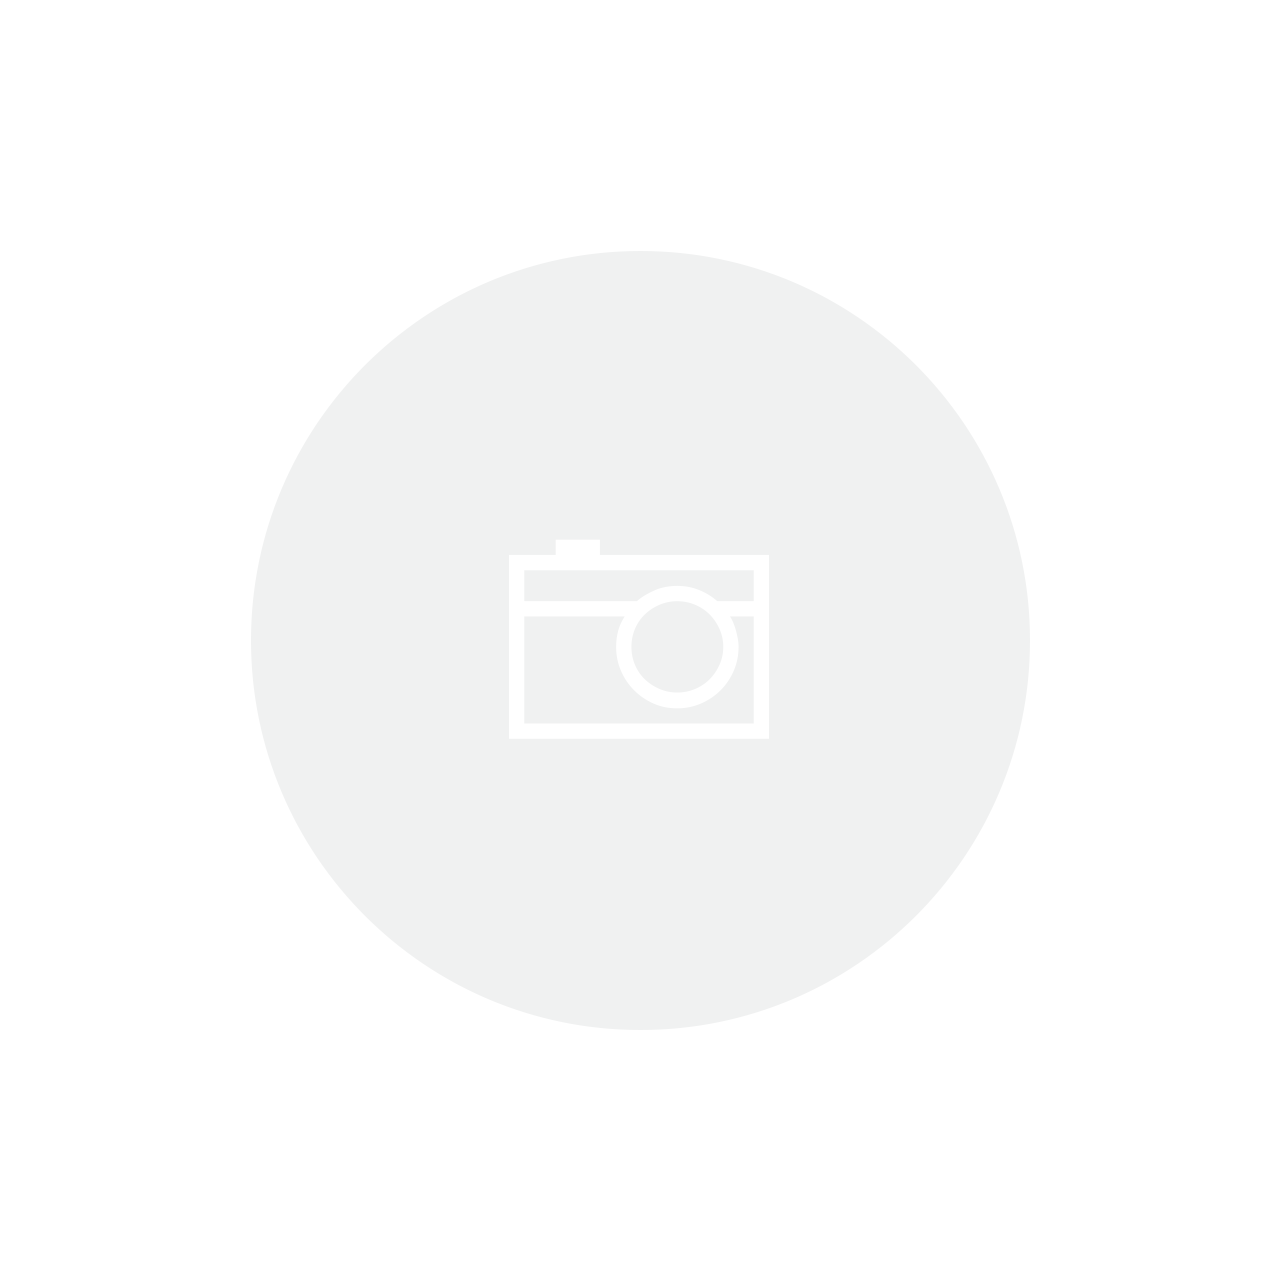 MONITOR BENQ ZOWIE XL2411 24